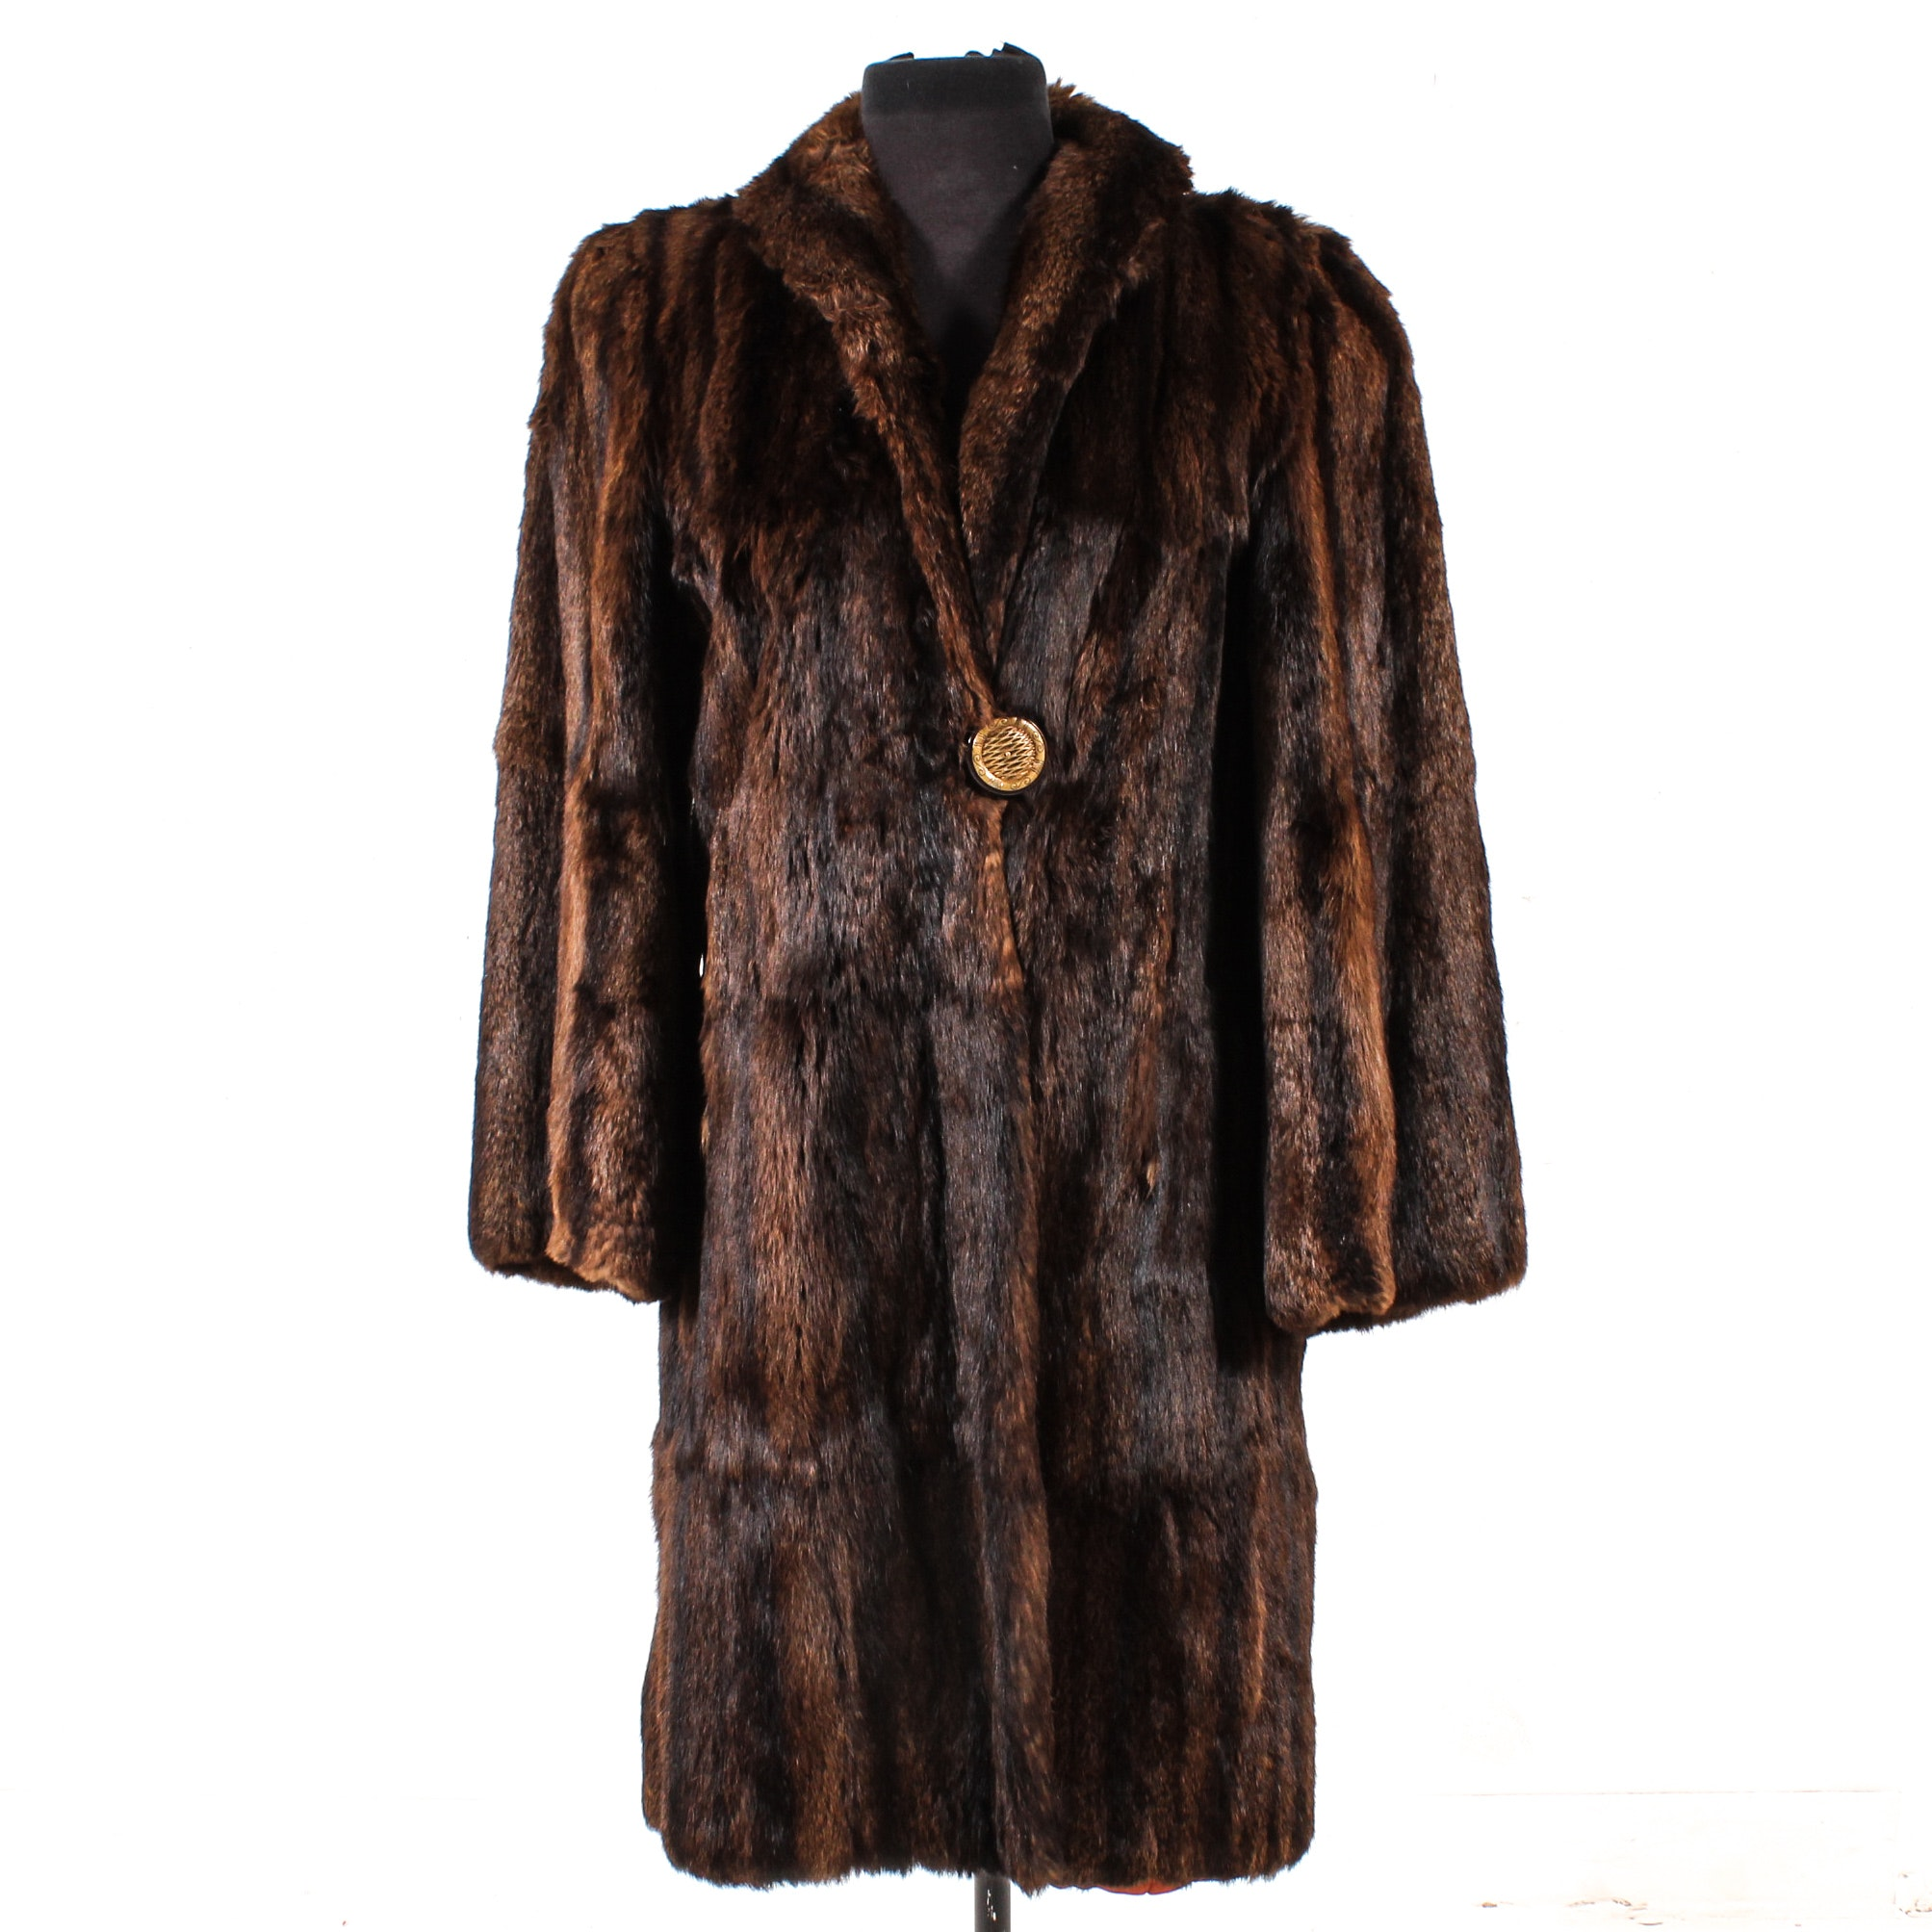 Dyed Mahogany Muskrat Fur Coat, Mid-20th Century Vintage